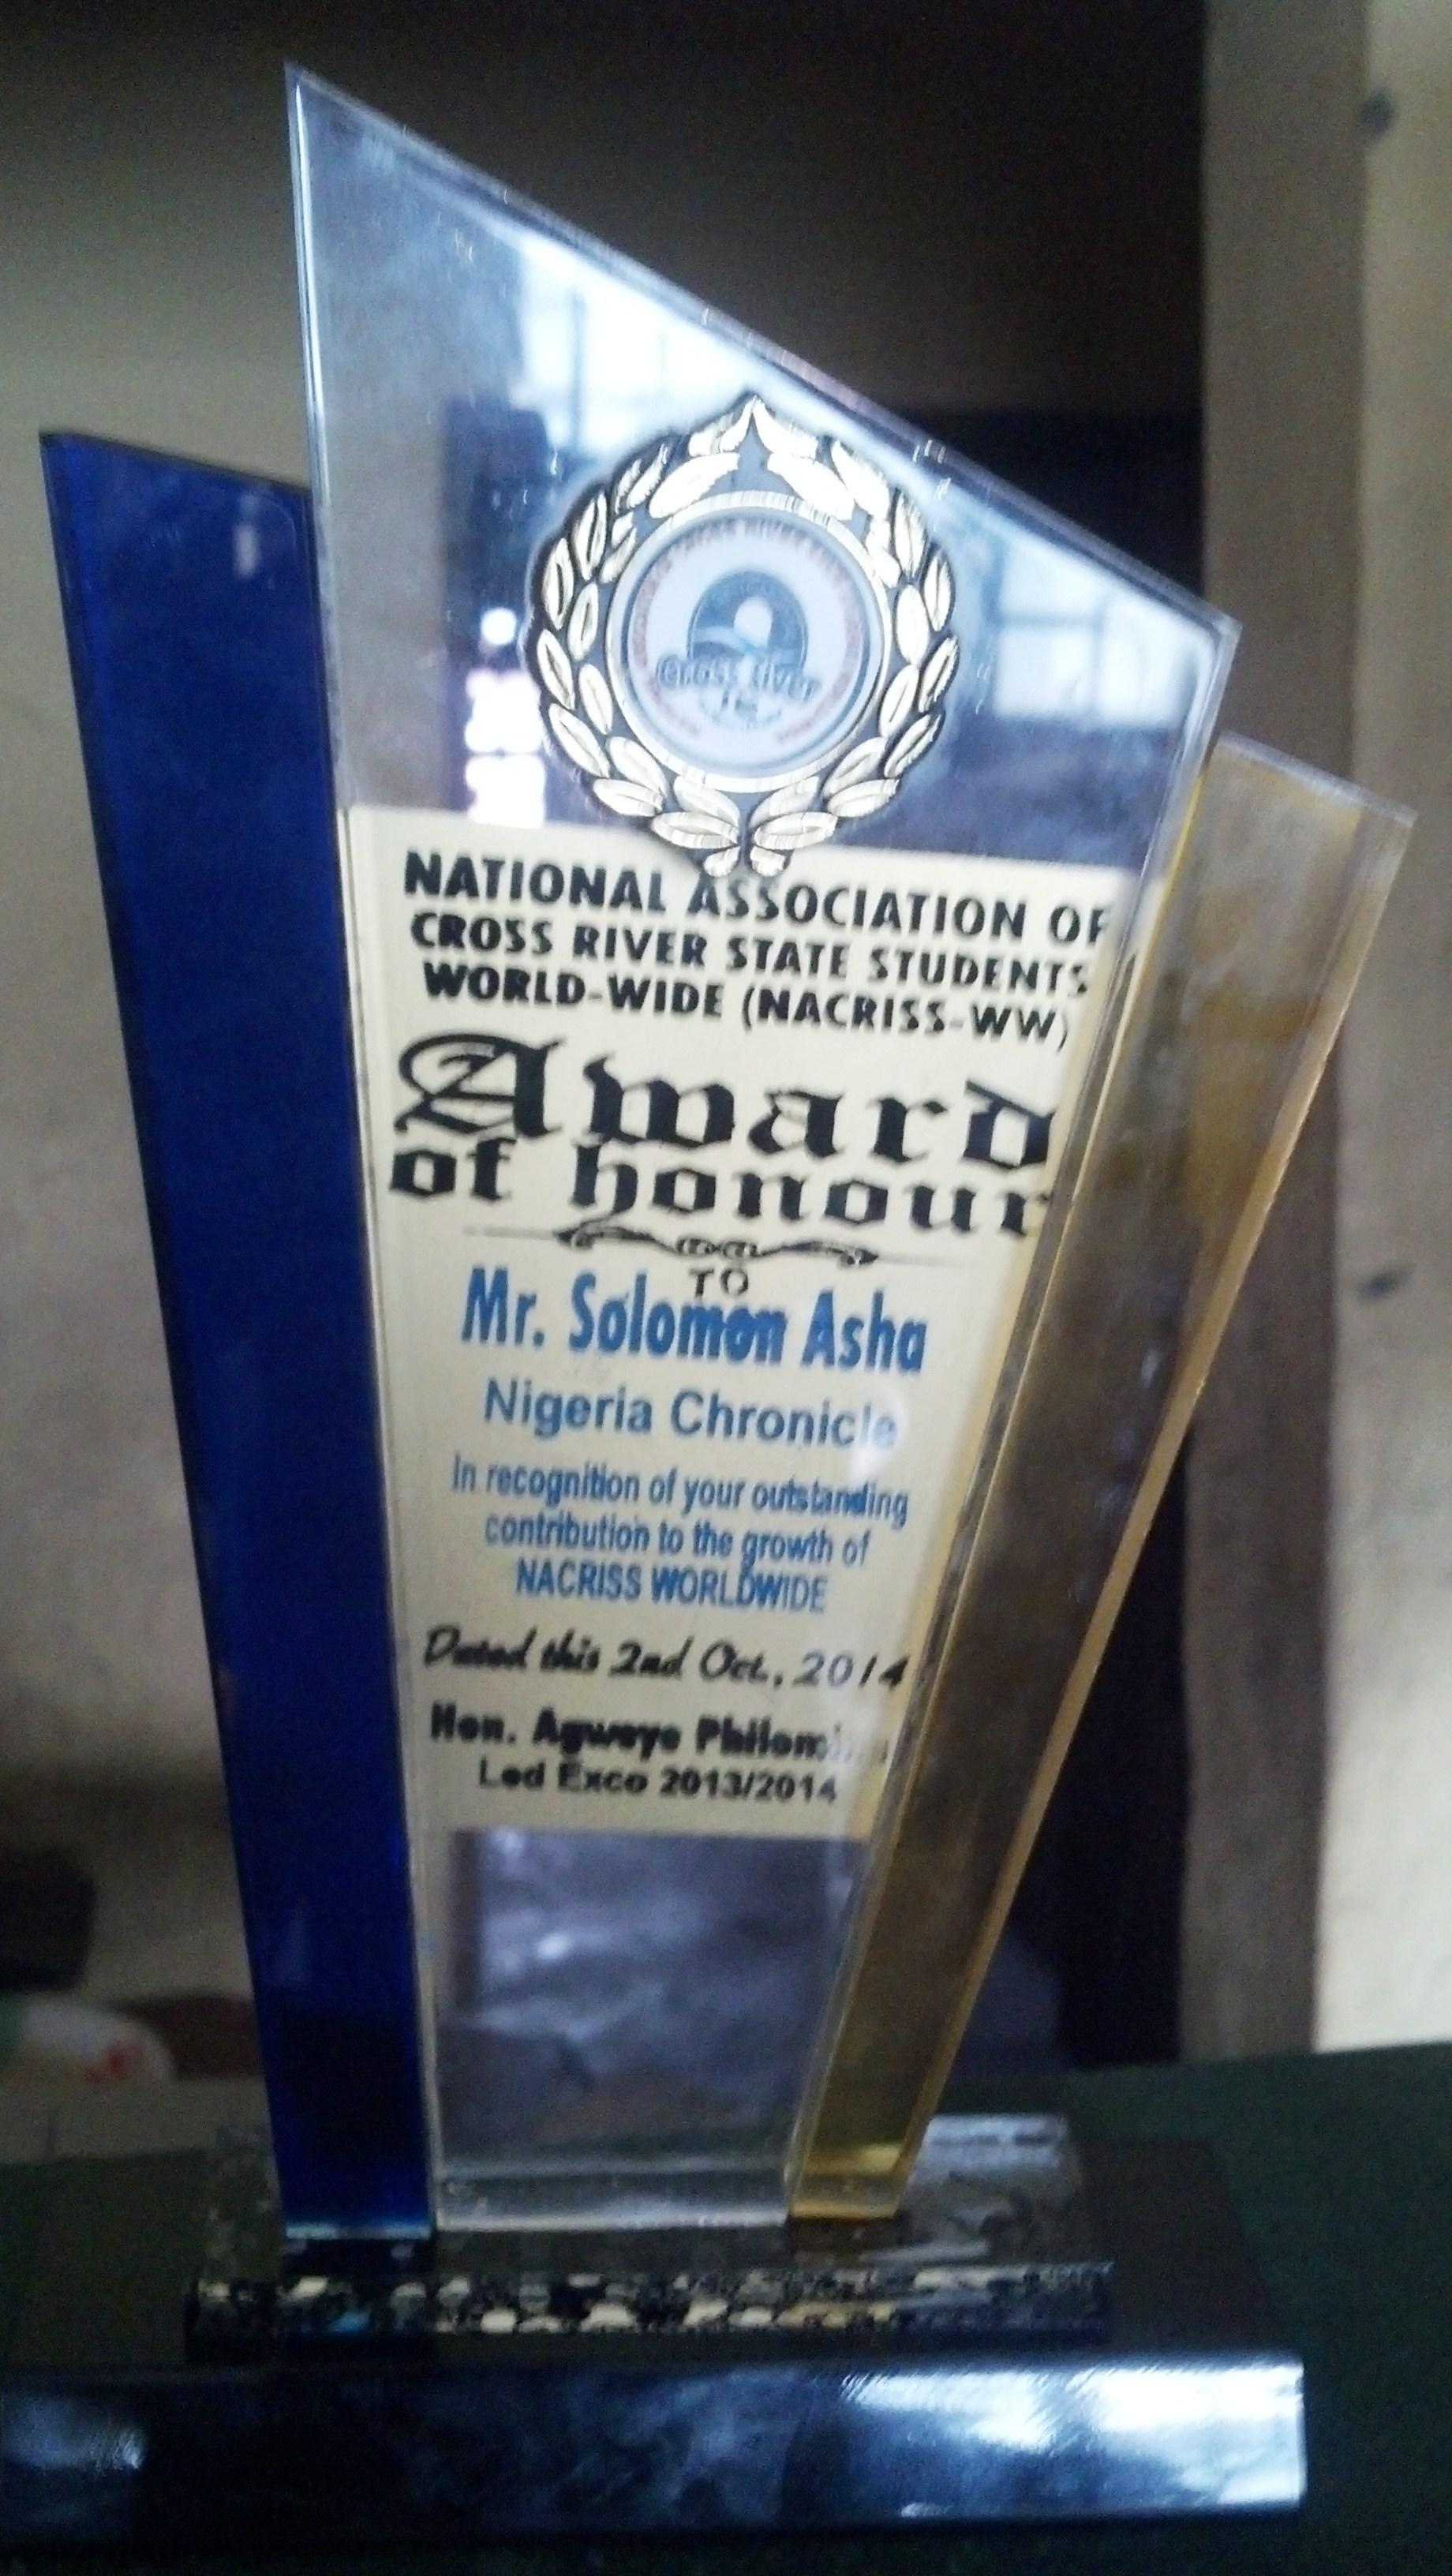 NACRISS-WW Award of Honor to Mr. Solomon Asha